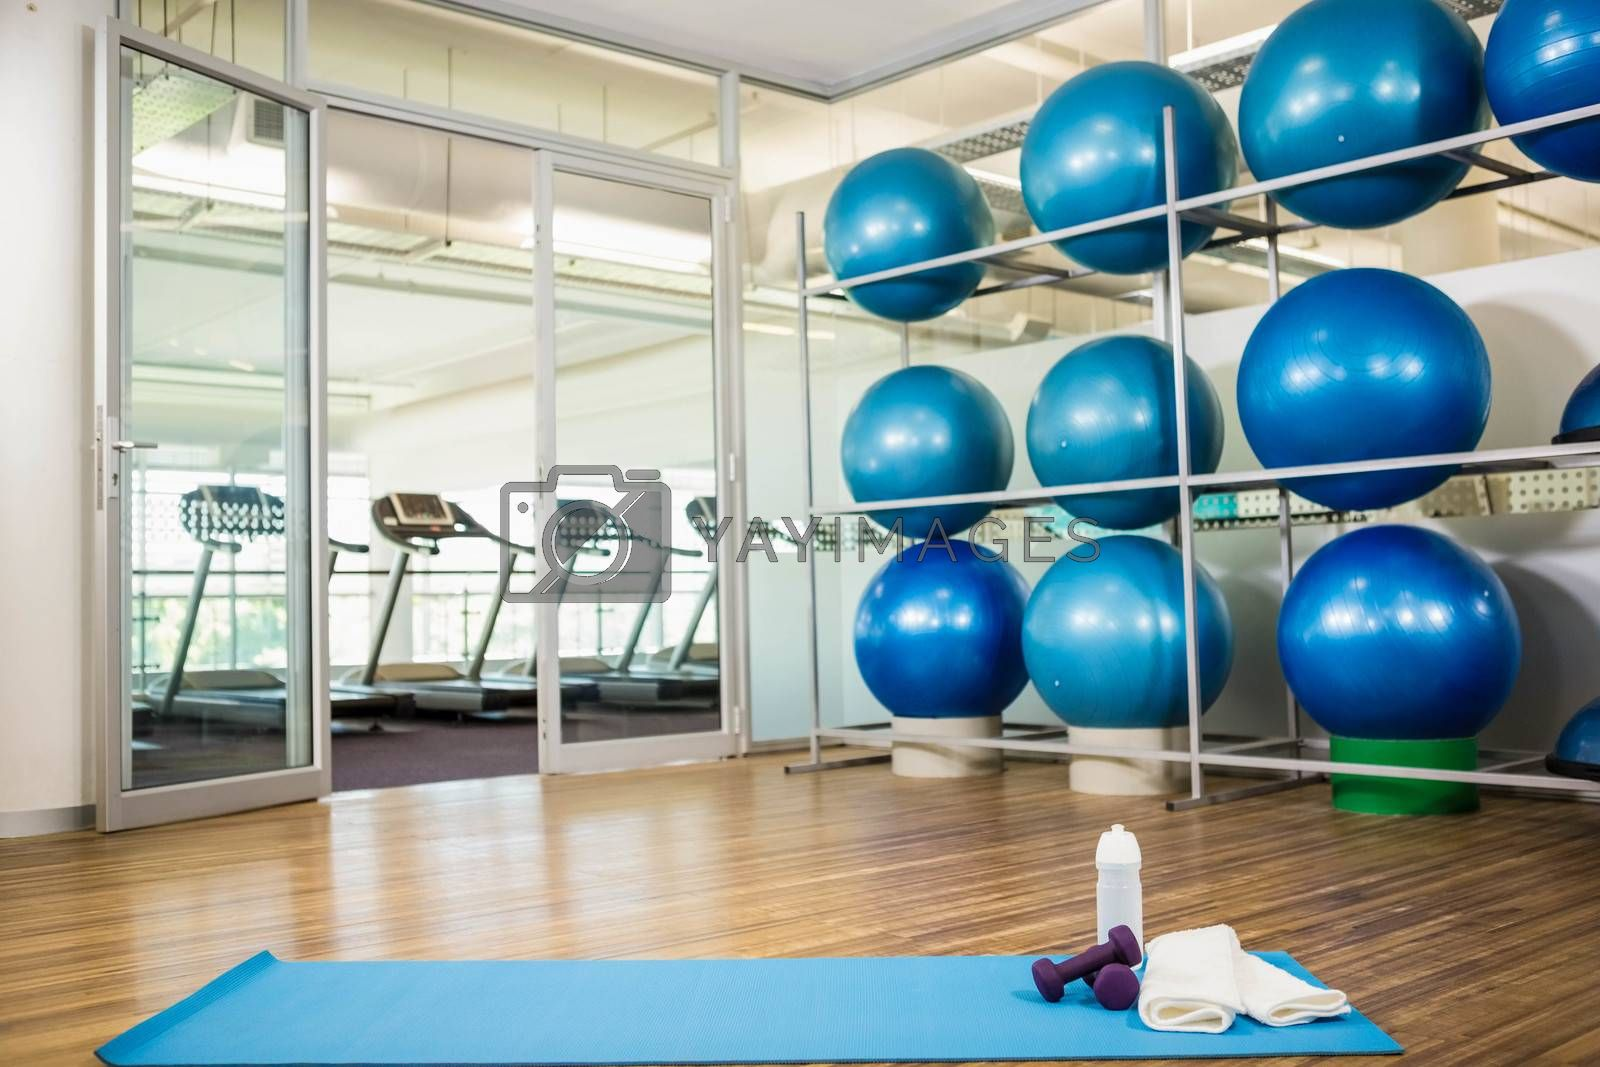 Gym with no people by Wavebreakmedia